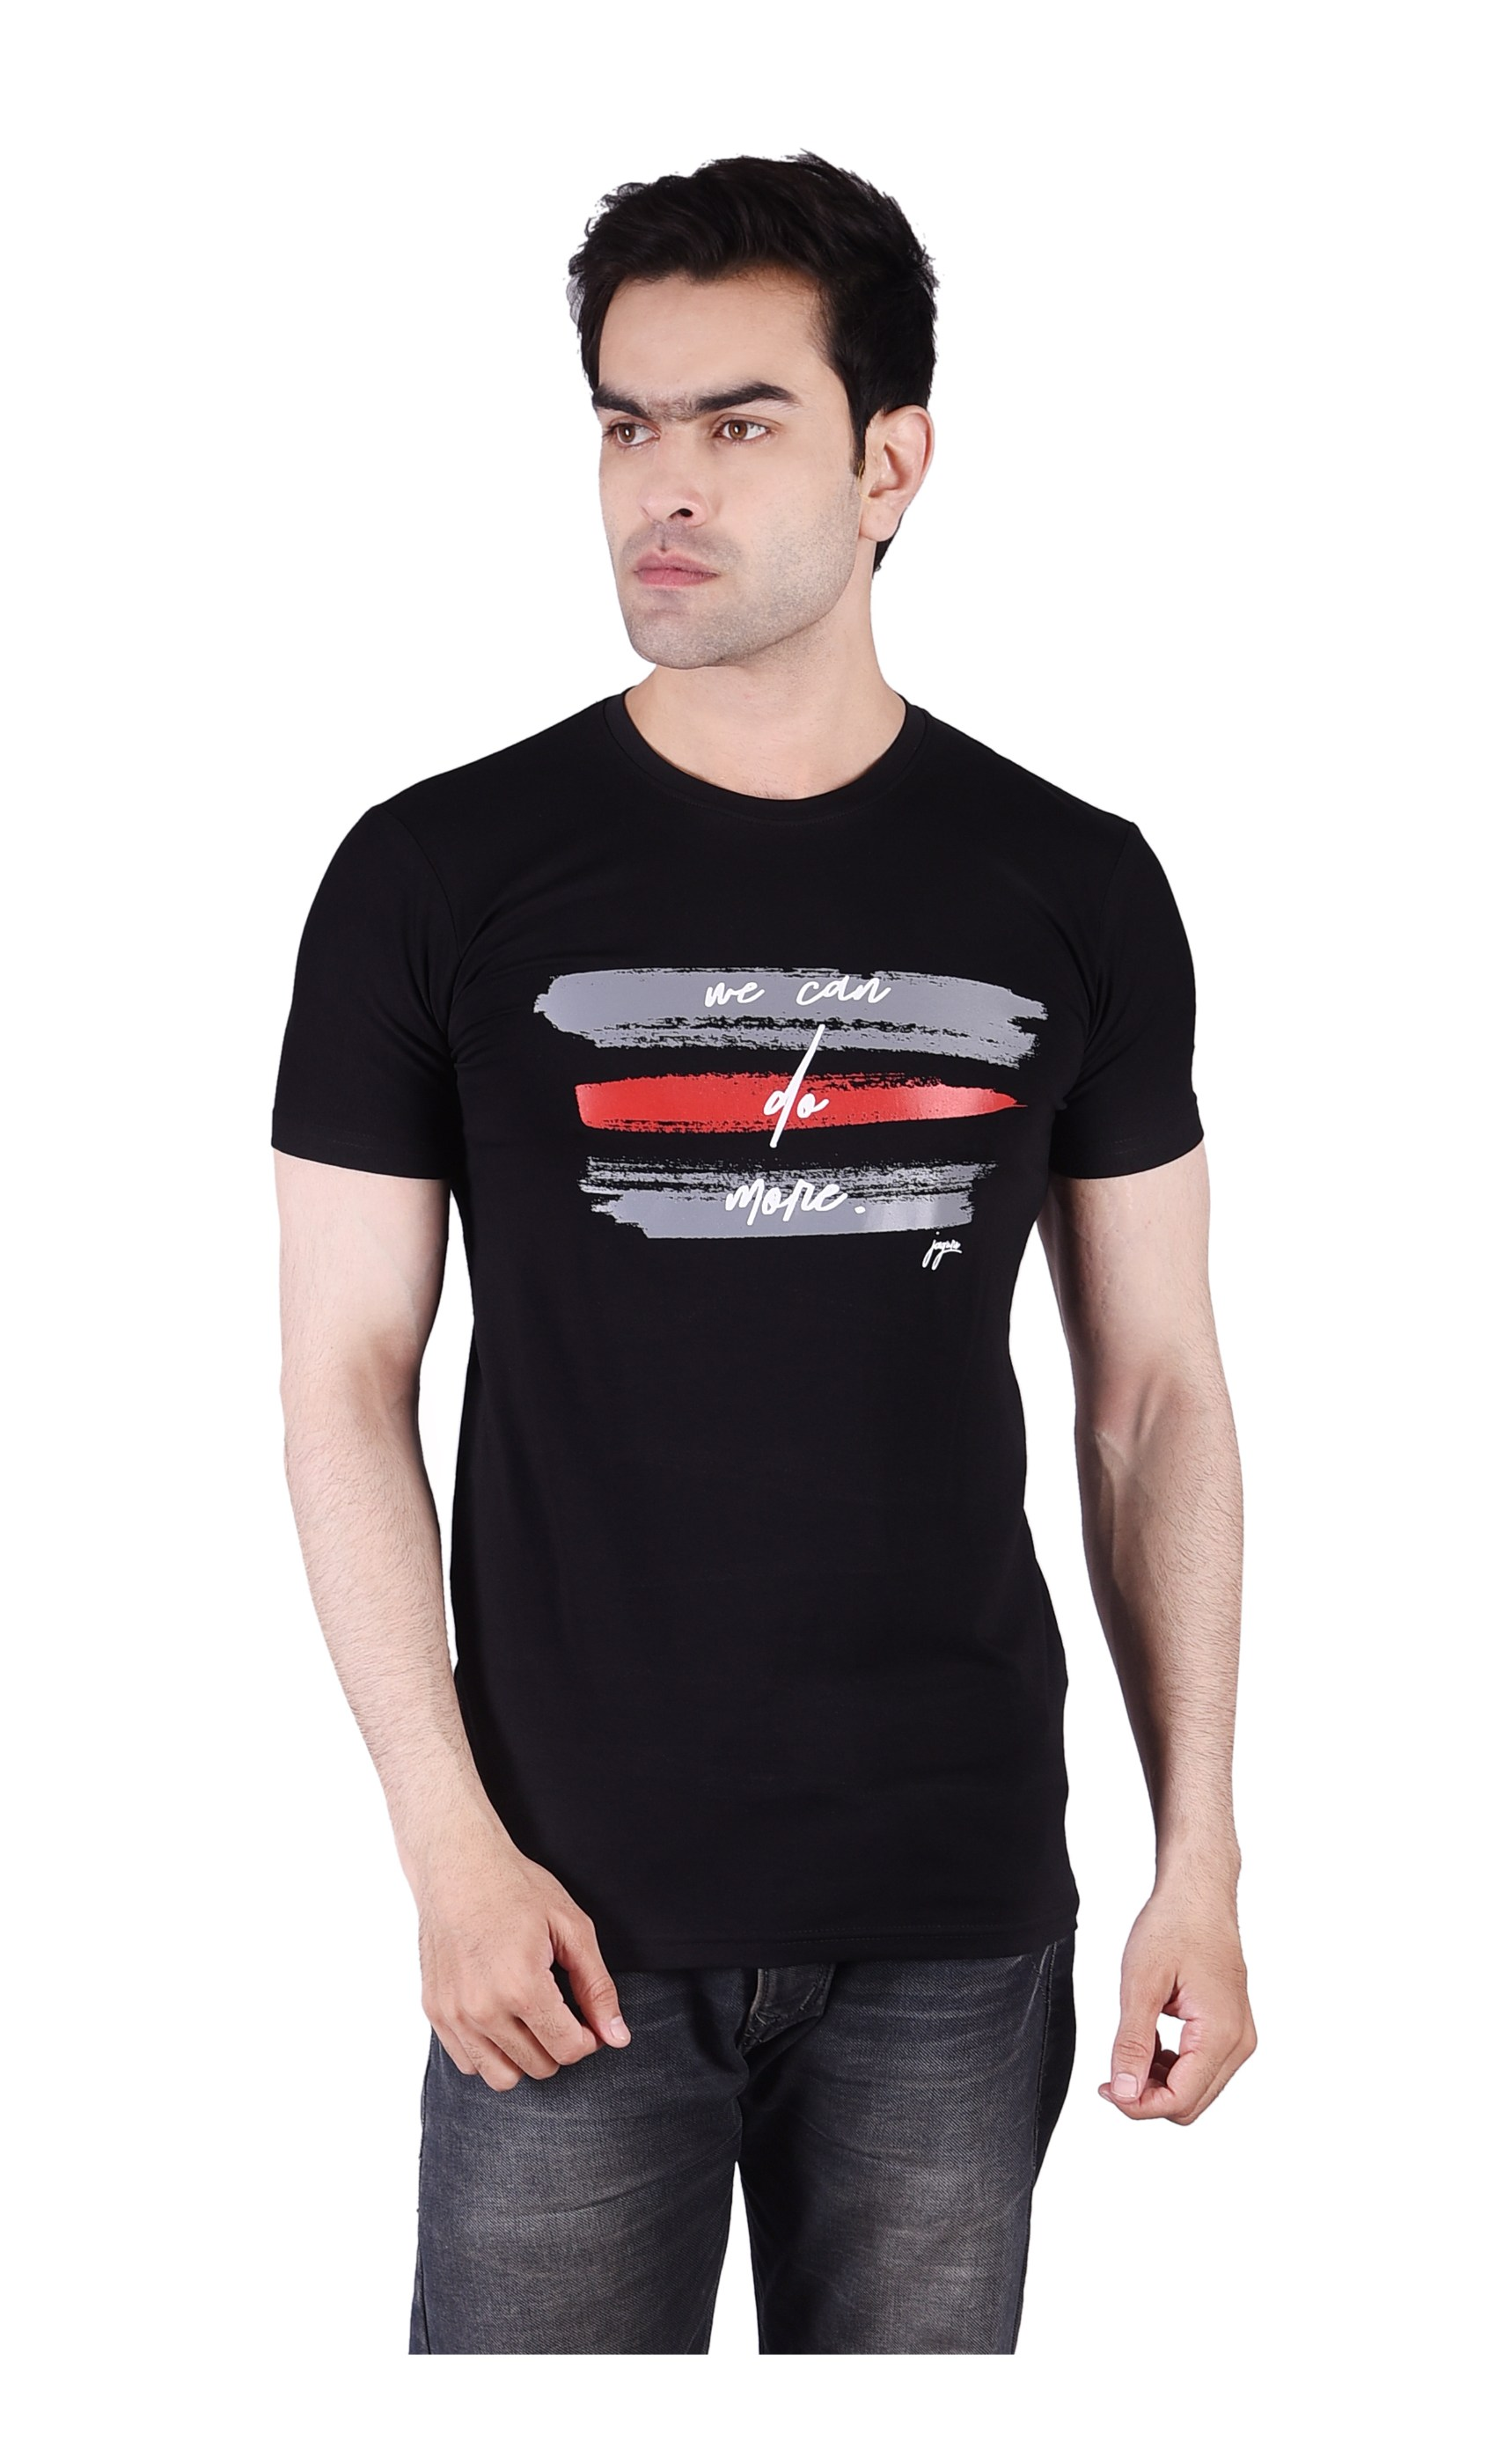 JAGURO | JAGURO men's printed cotton T-Shirt.